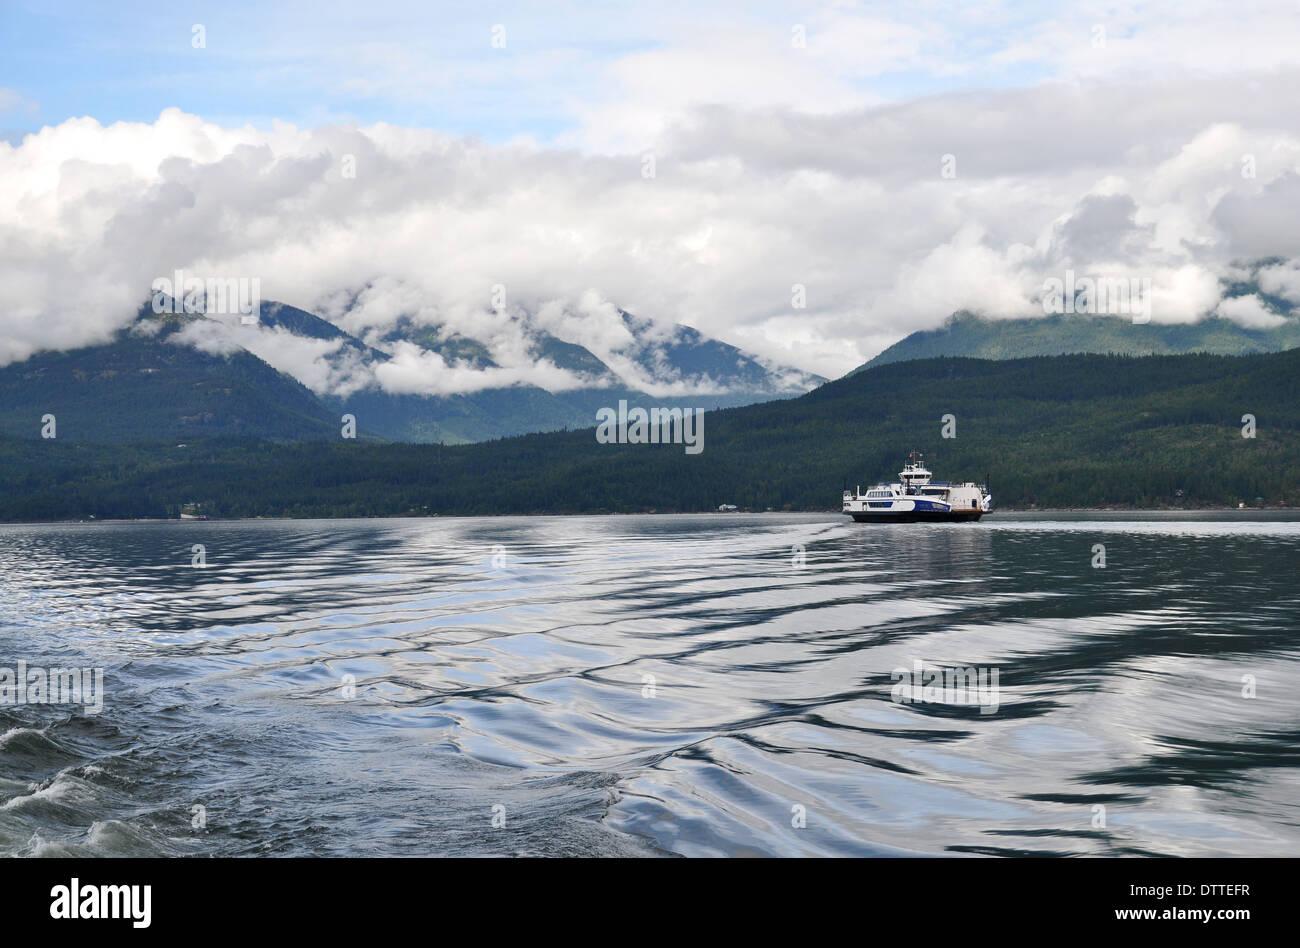 Kootenay Lake, Balfour, British Columbia, Canada - Stock Image